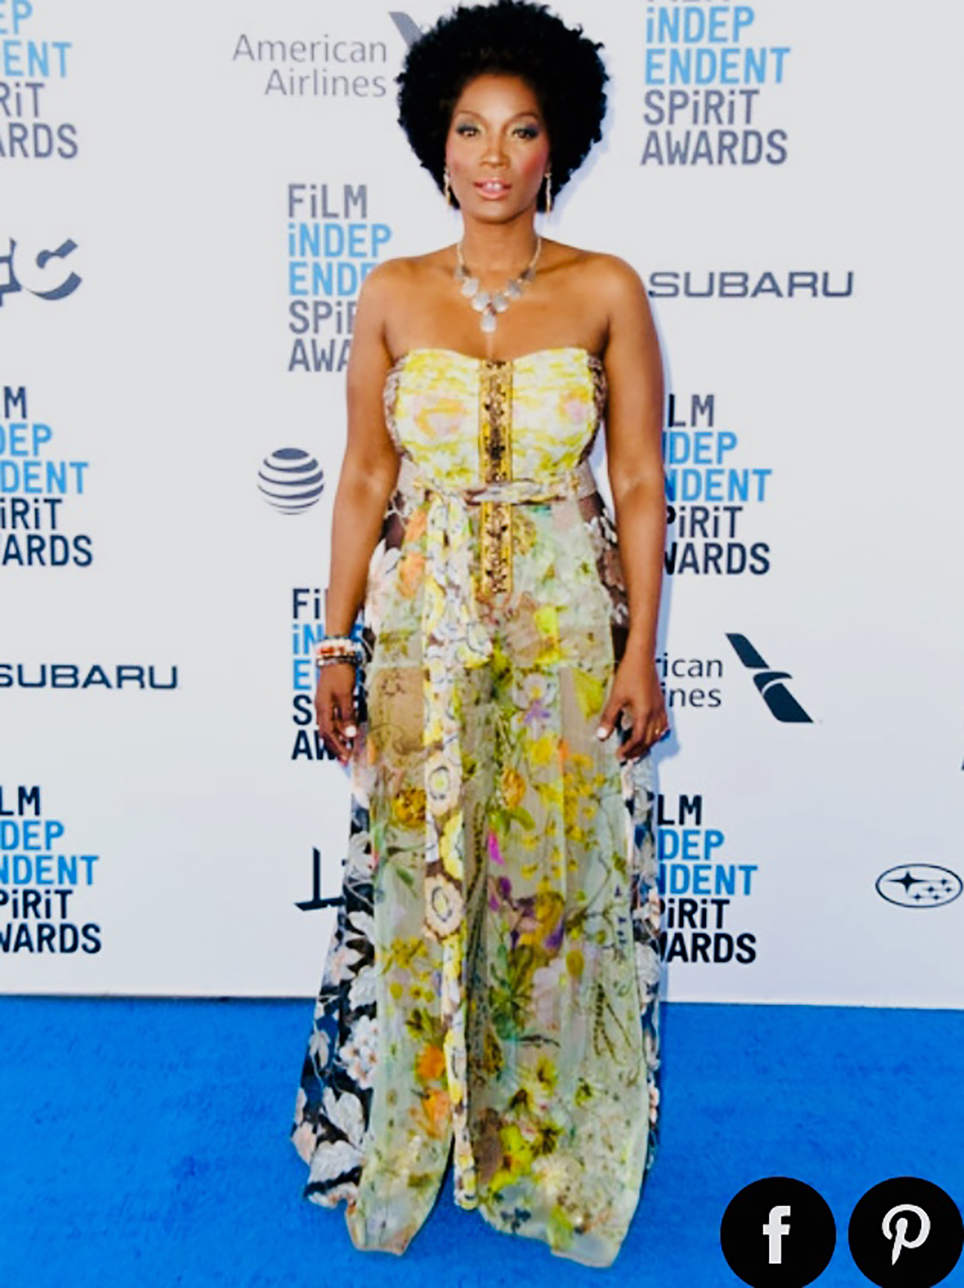 Yolonda-Ross-blue-carpet-Spirit-Awards-2019.jpeg